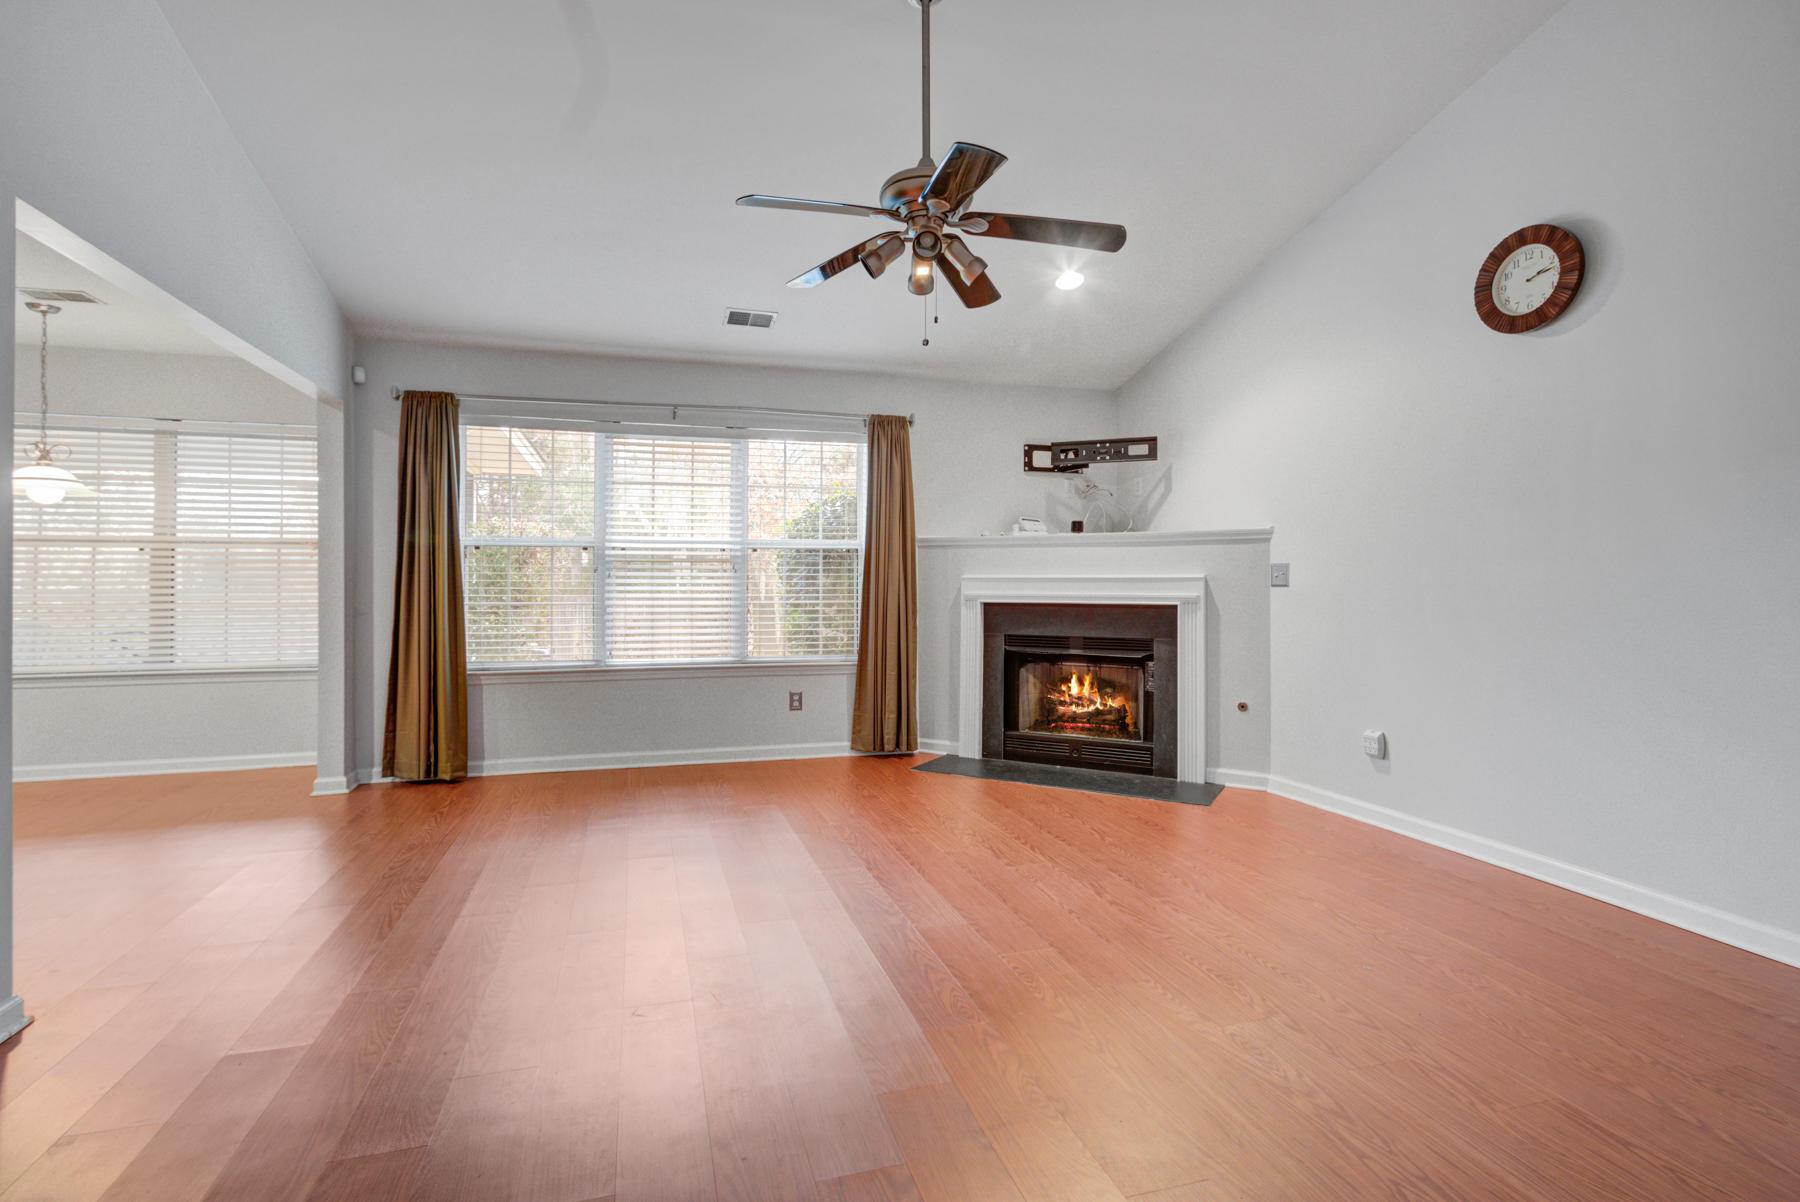 Grand Oaks Plantation Homes For Sale - 564 Hainesworth, Charleston, SC - 13